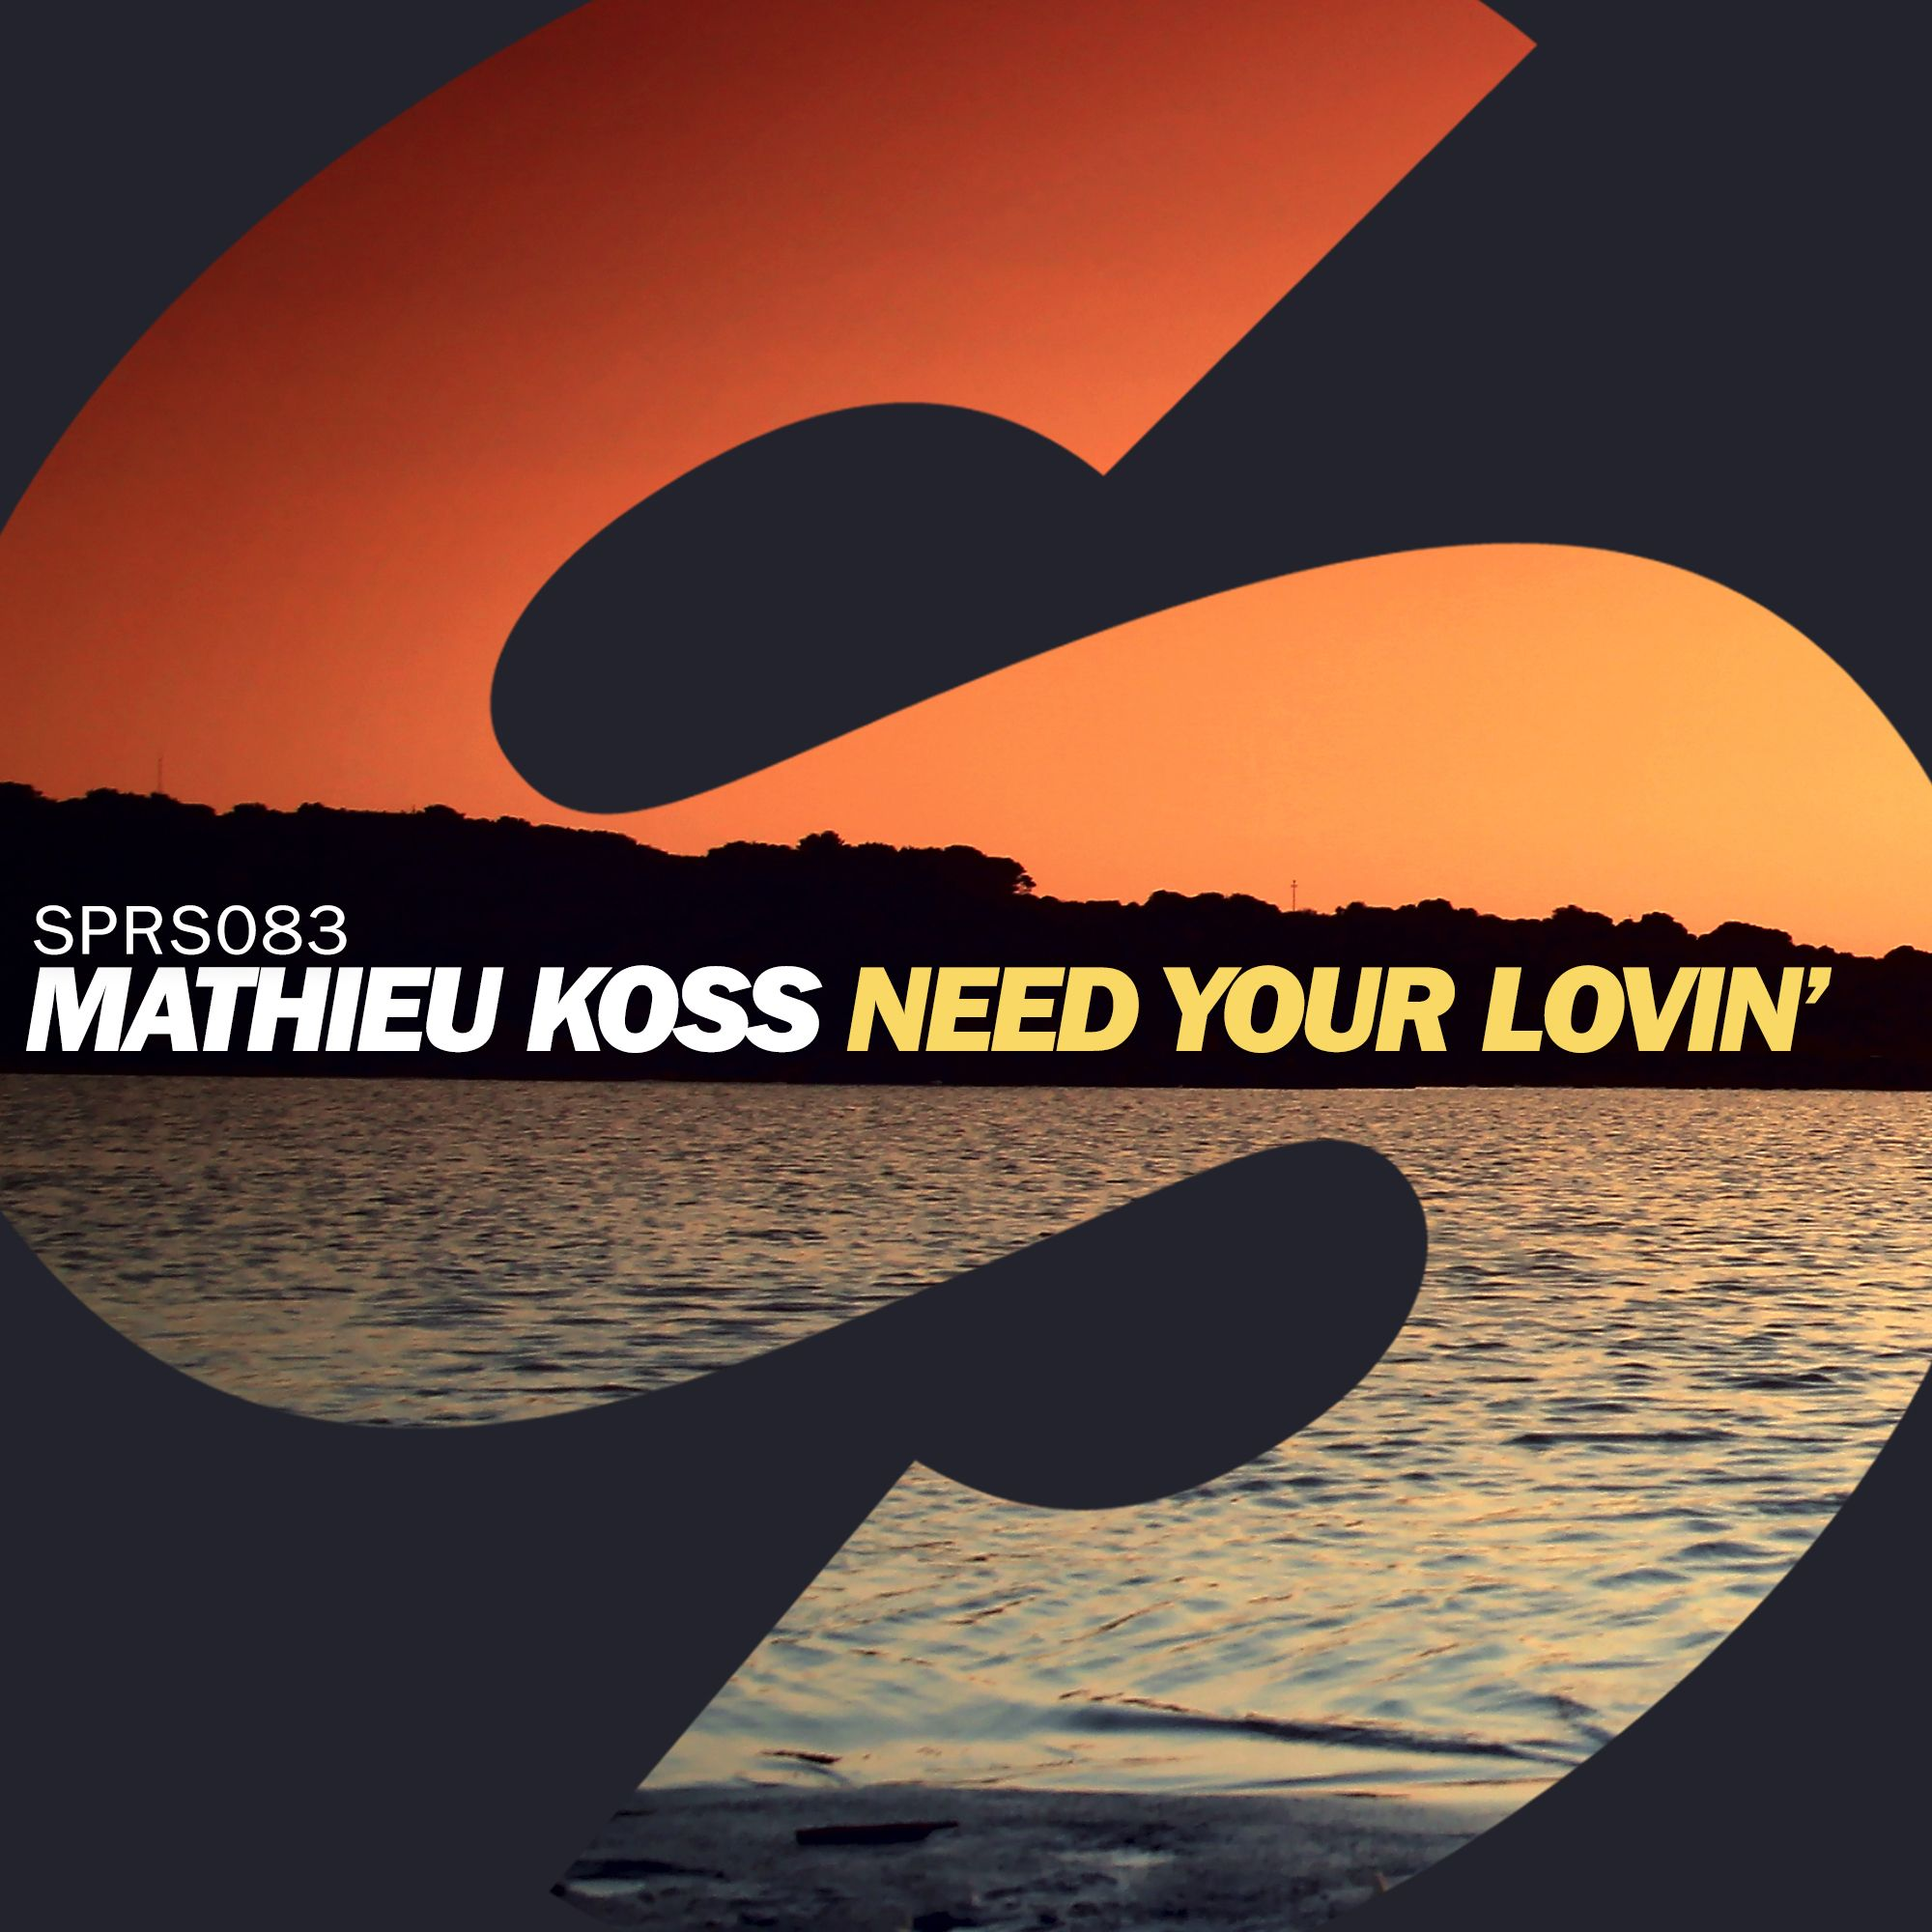 sprs_mathieu_koss_-_need_your_lovin.jpg